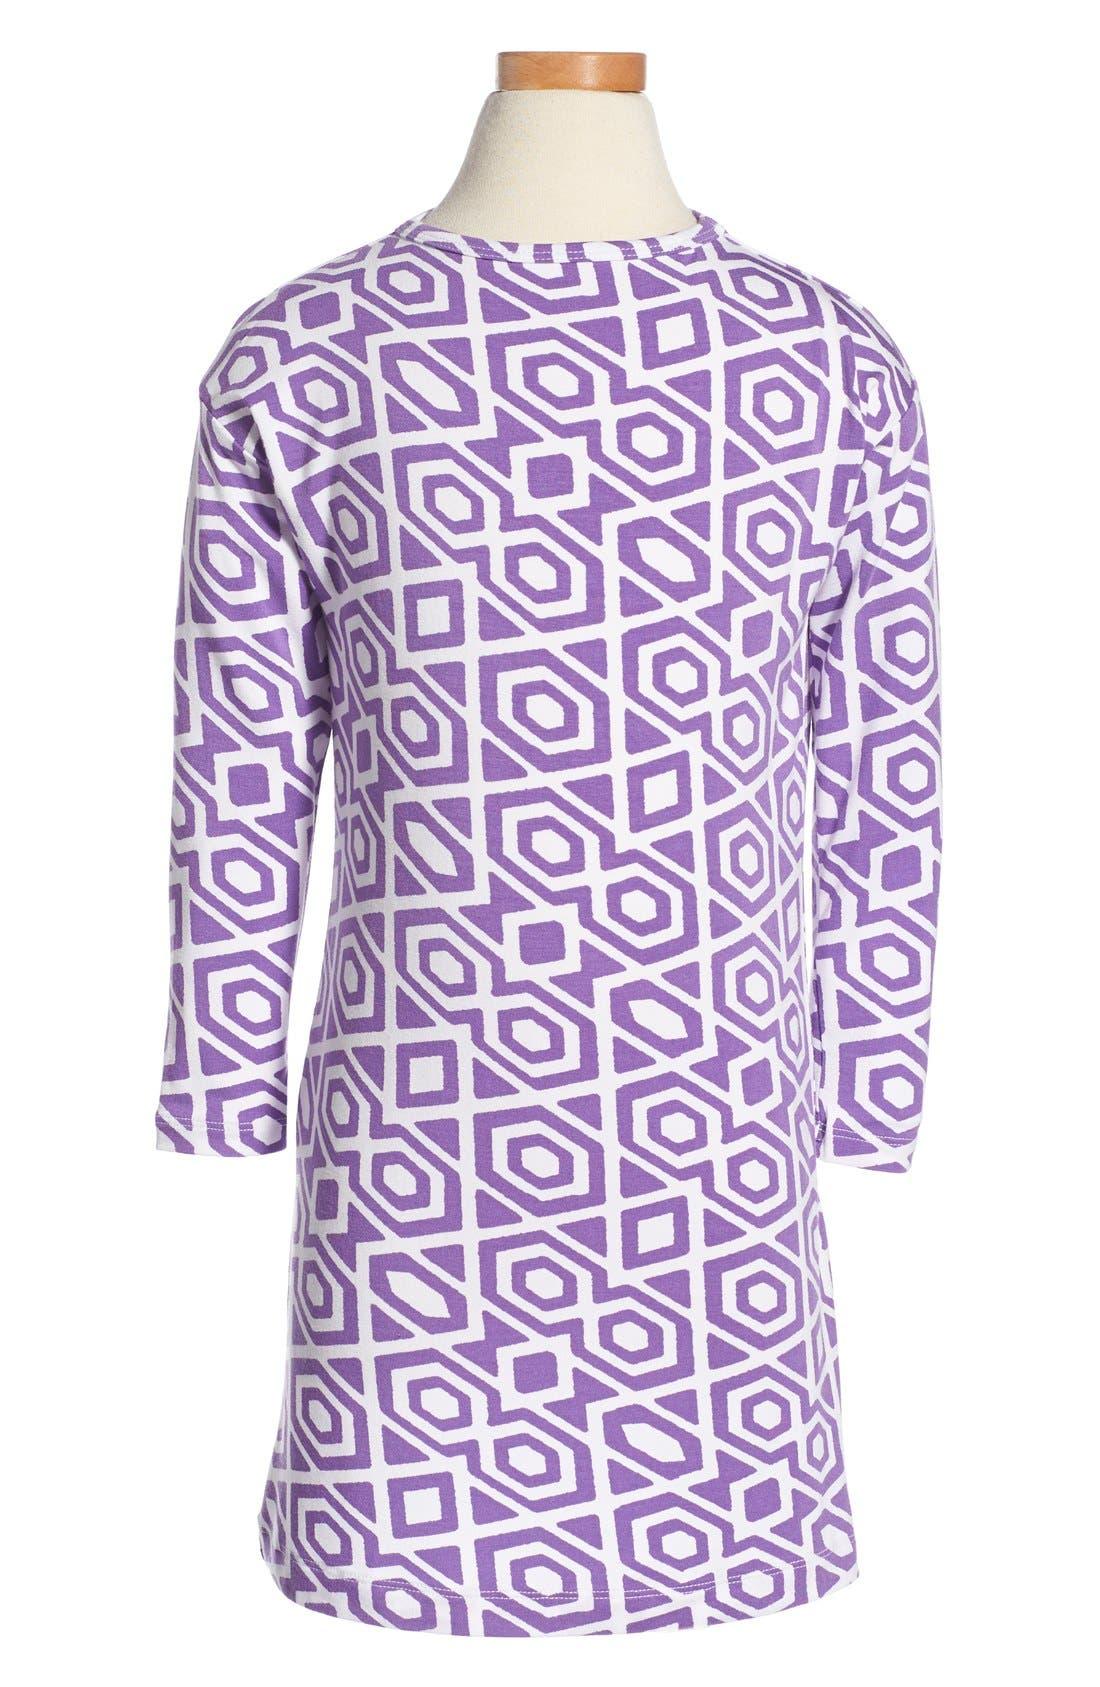 MOTT 50 UPF 50+ Long Sleeve Dress